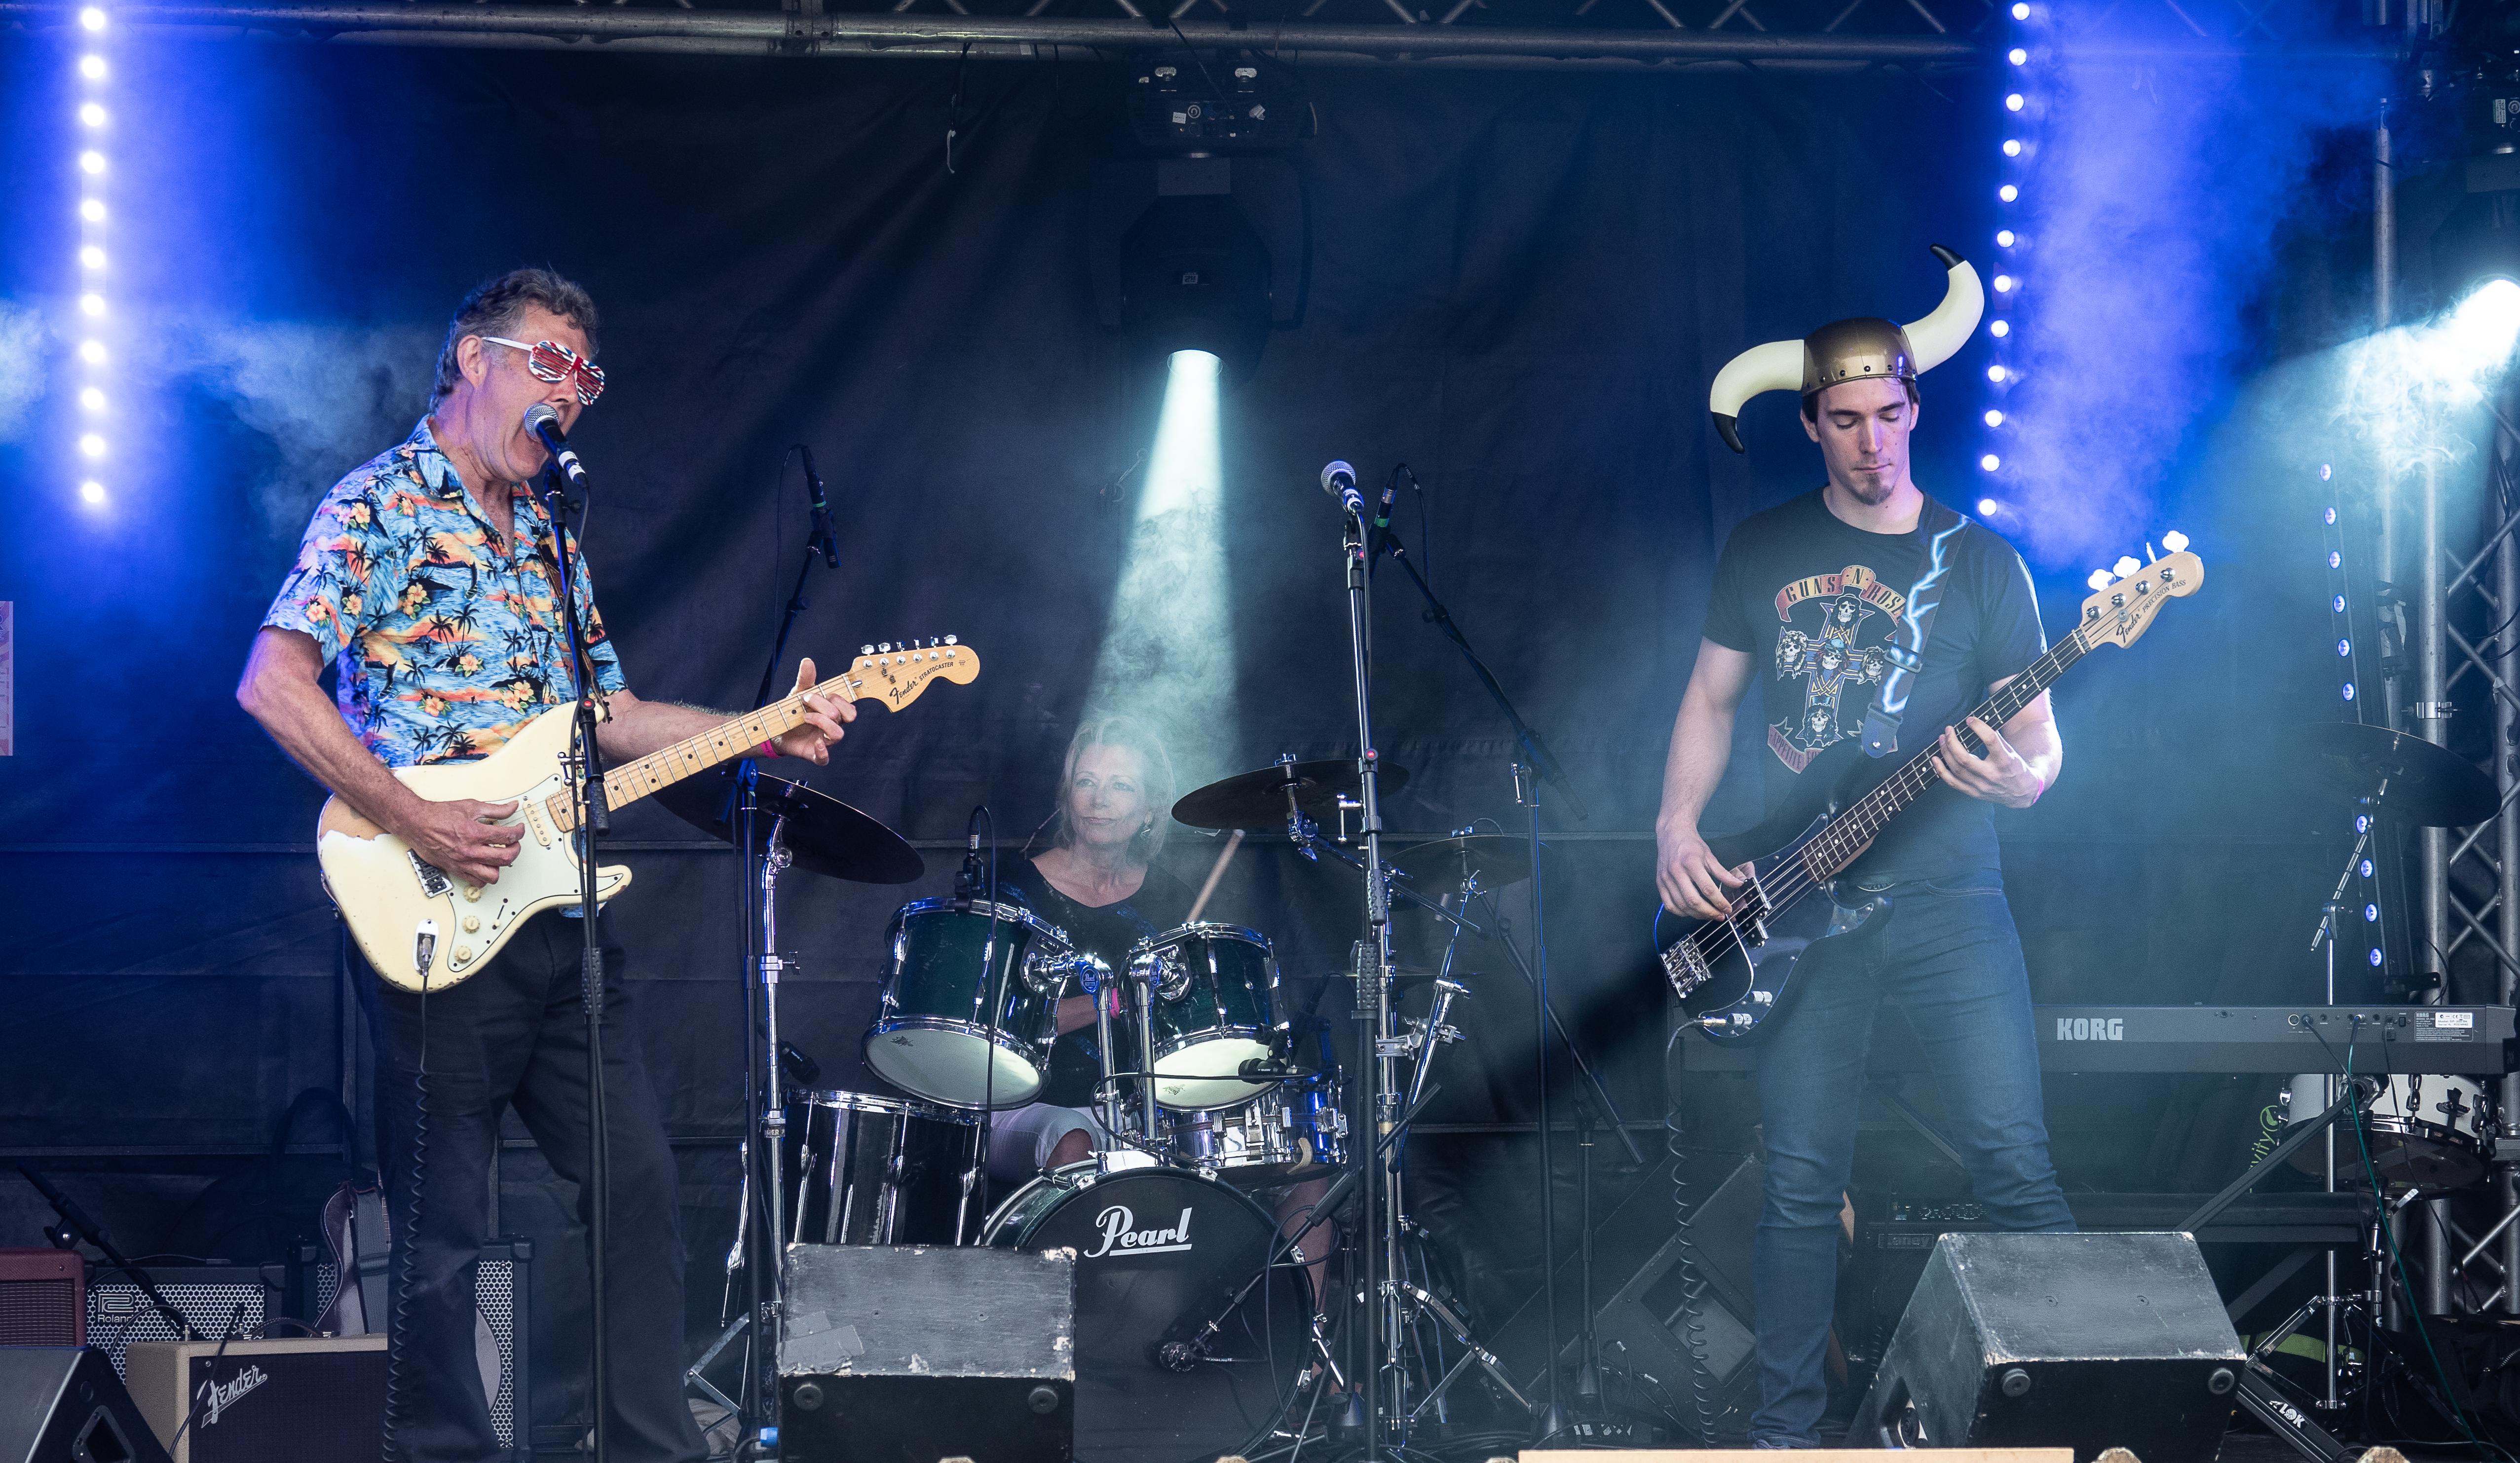 Festival 2019 - Half Moon (1089 of 1126)